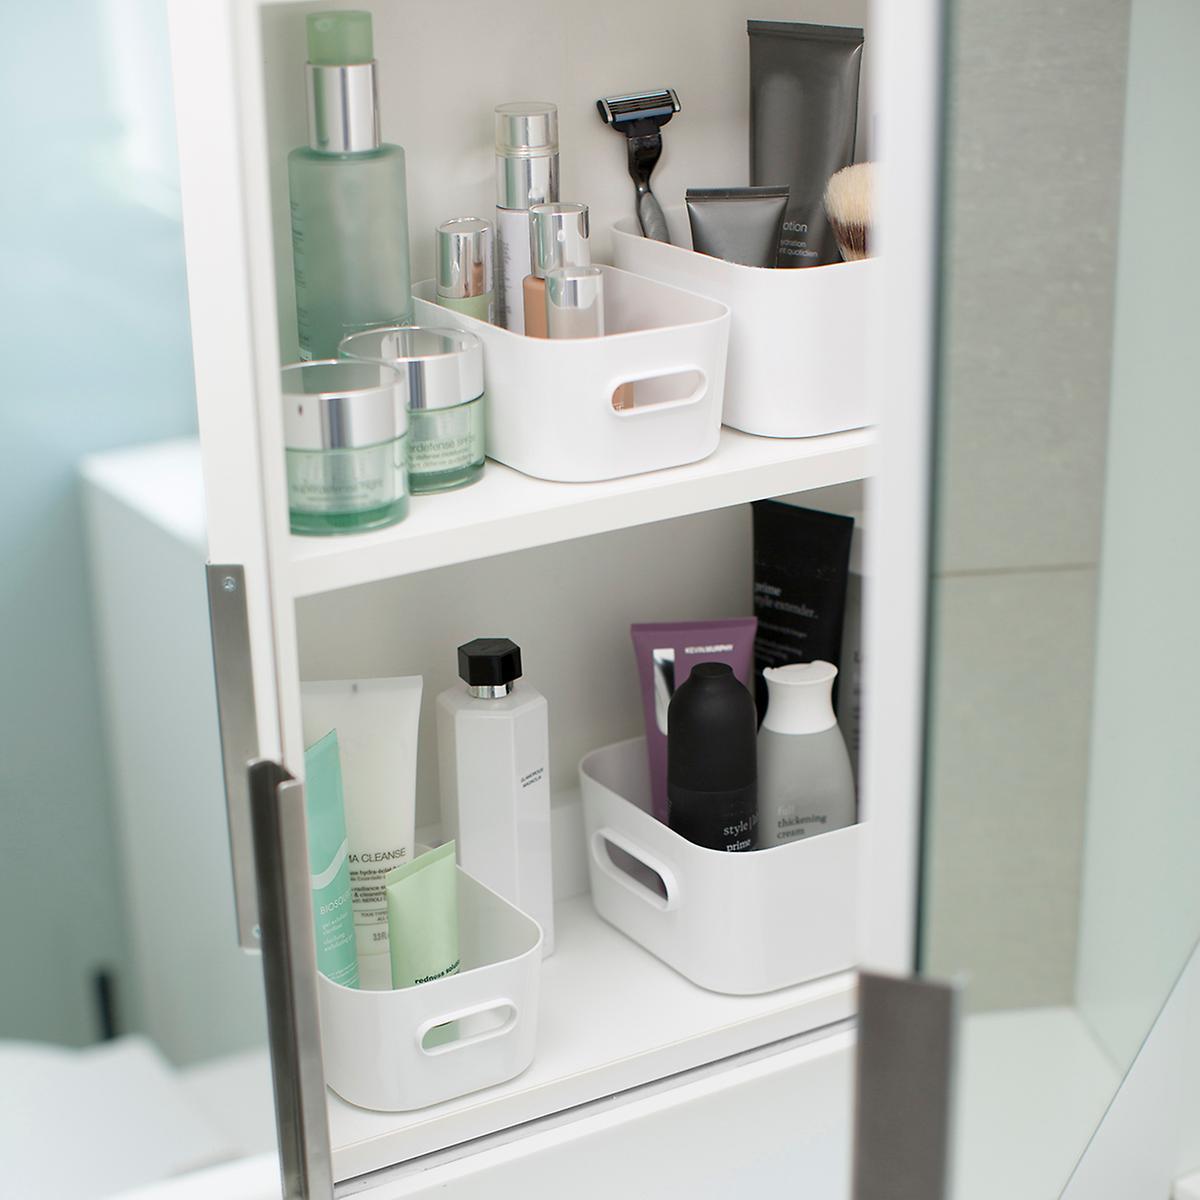 Under Sink Organizers Bathroom Cabinet Storage regarding proportions 1200 X 1200